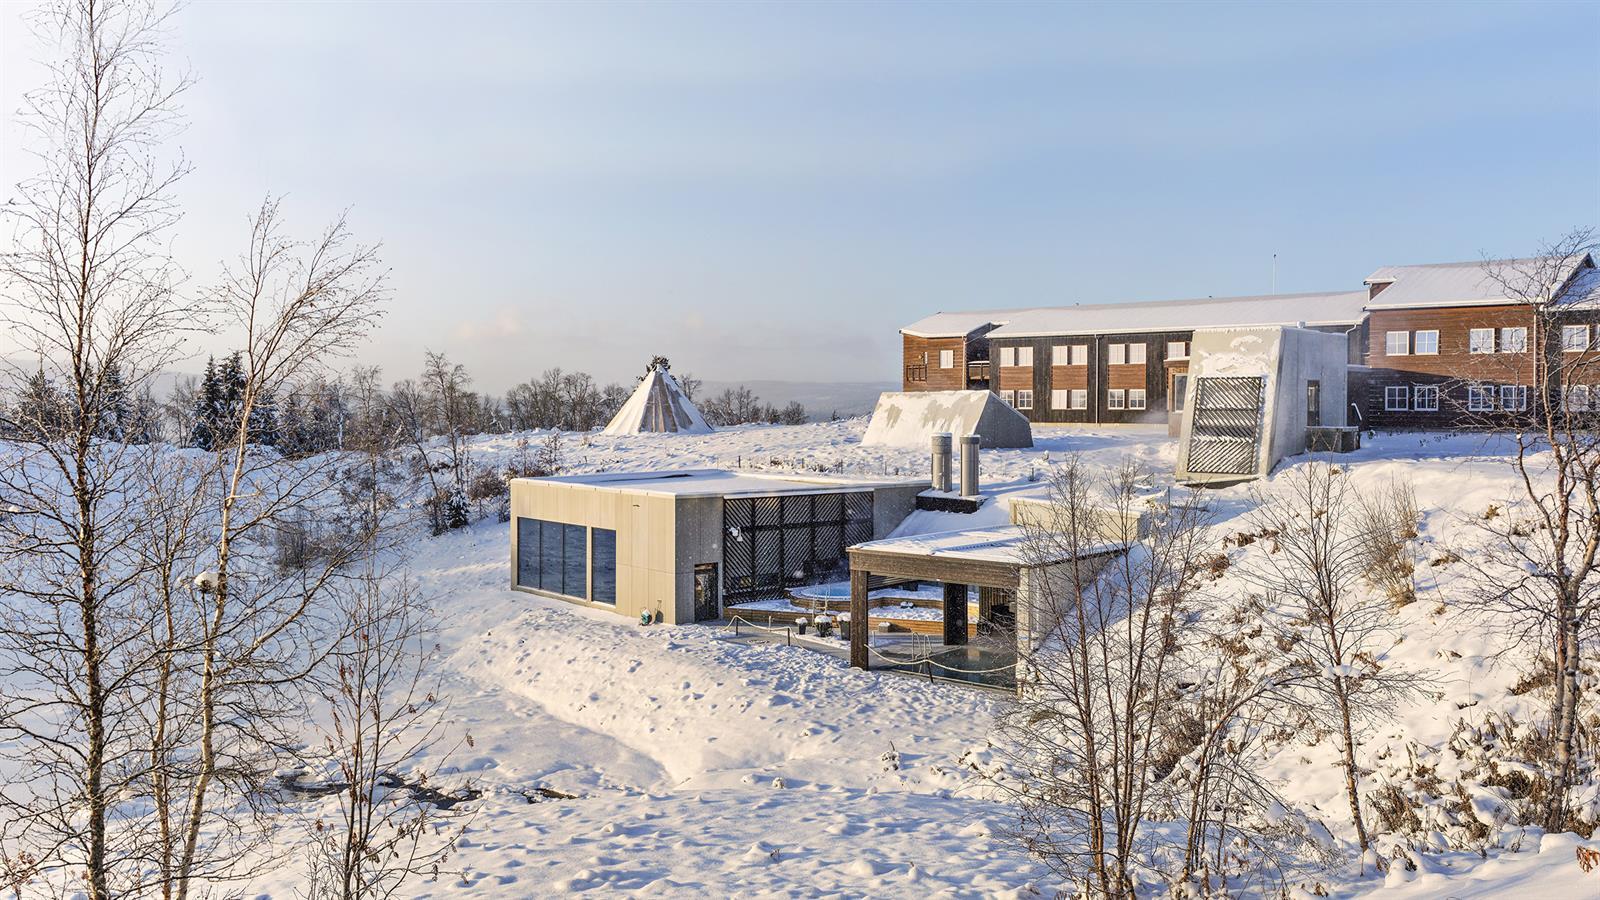 Vinteridyll på Røros Hotell